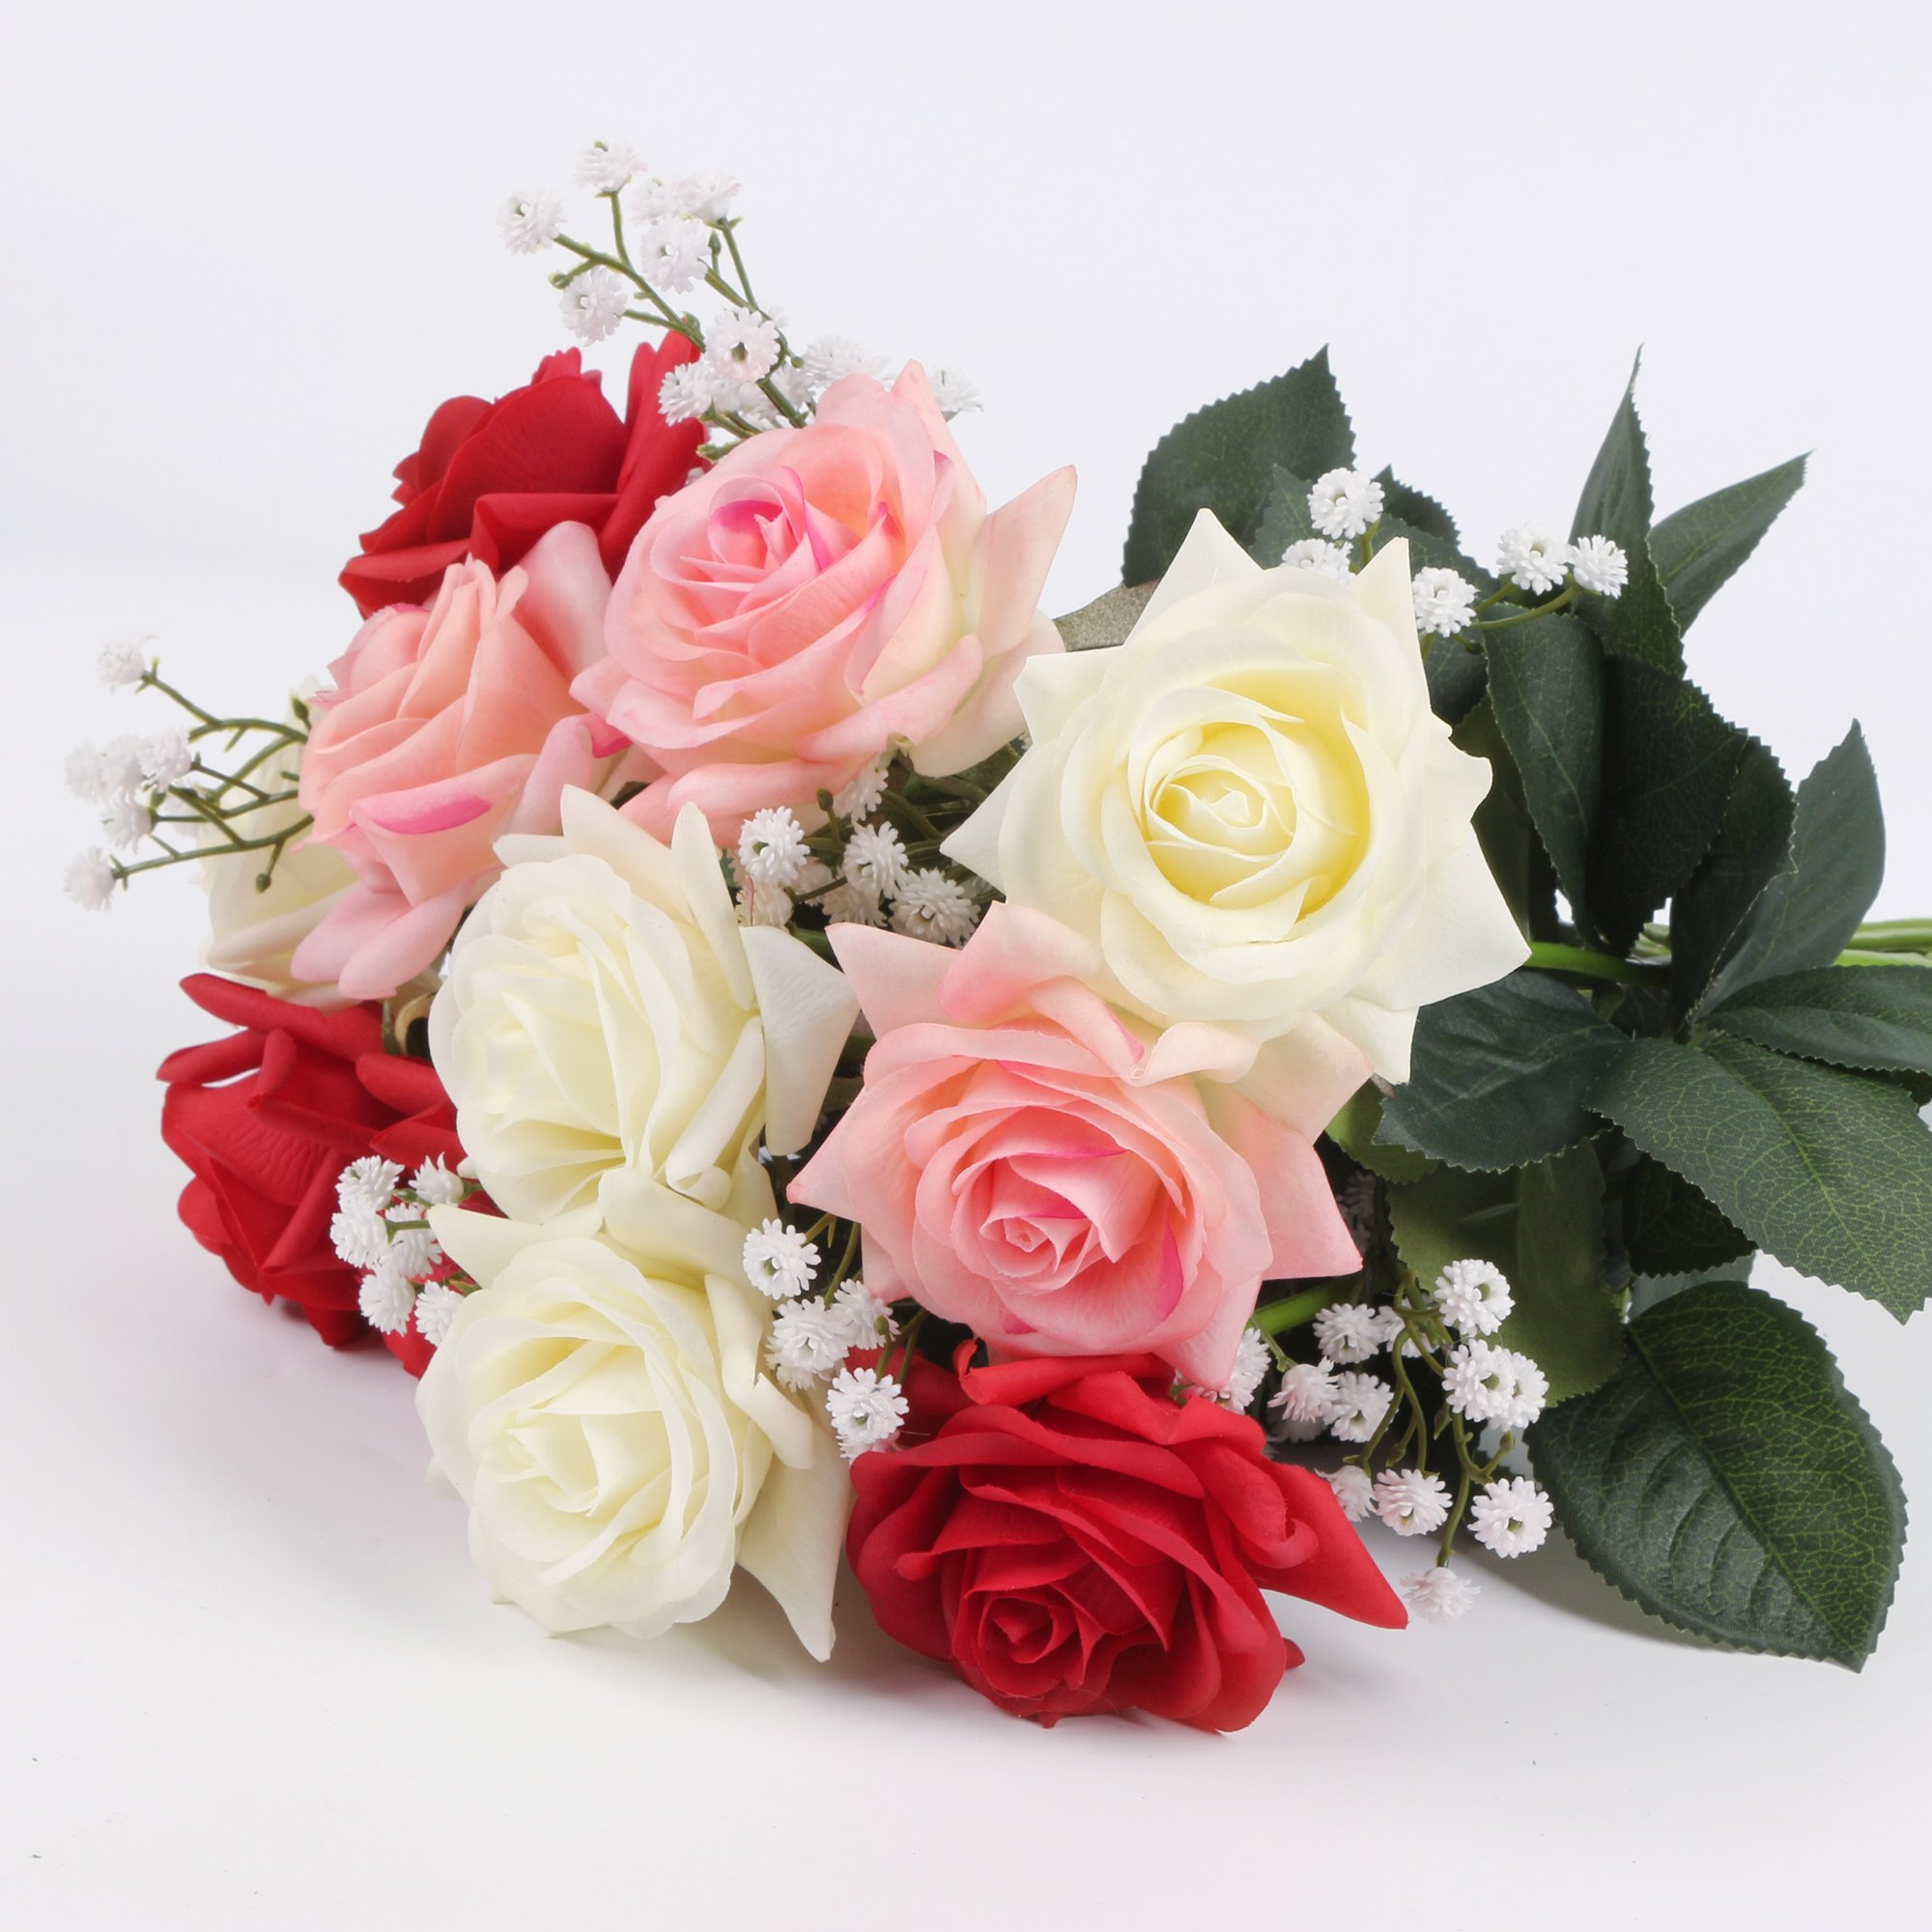 Senjie Artificial Fake Flowers Babys Breathgypsophila Bouquets For